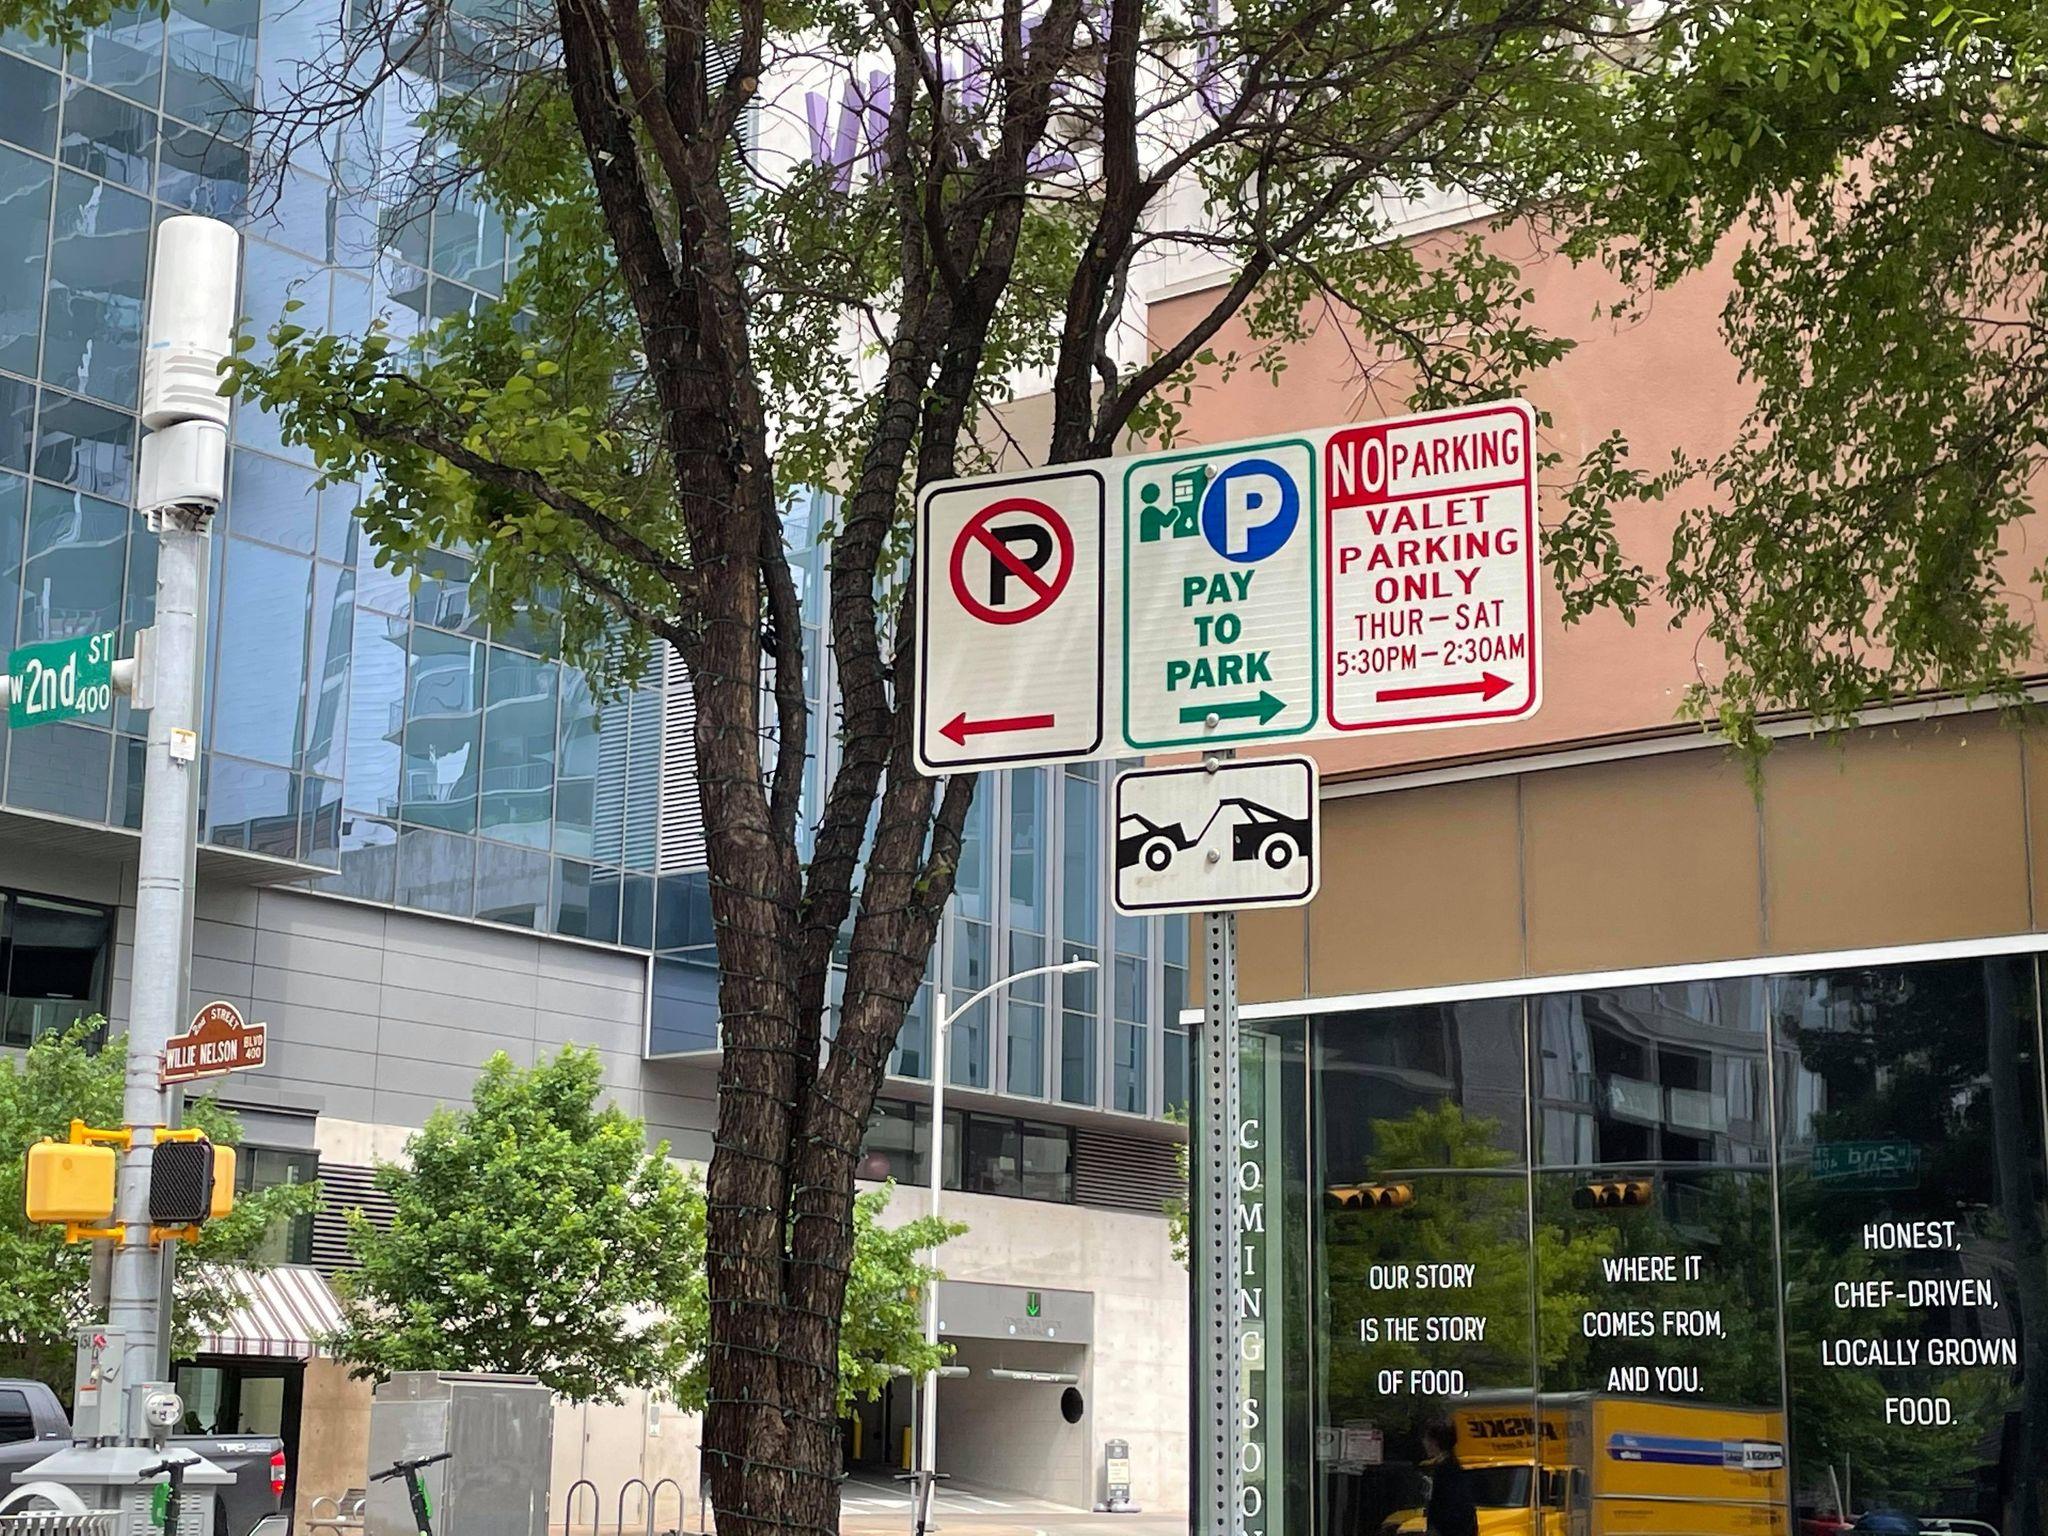 Parking sign in downtown Austin (KXAN Photo/Jaclyn Ramkissoon)